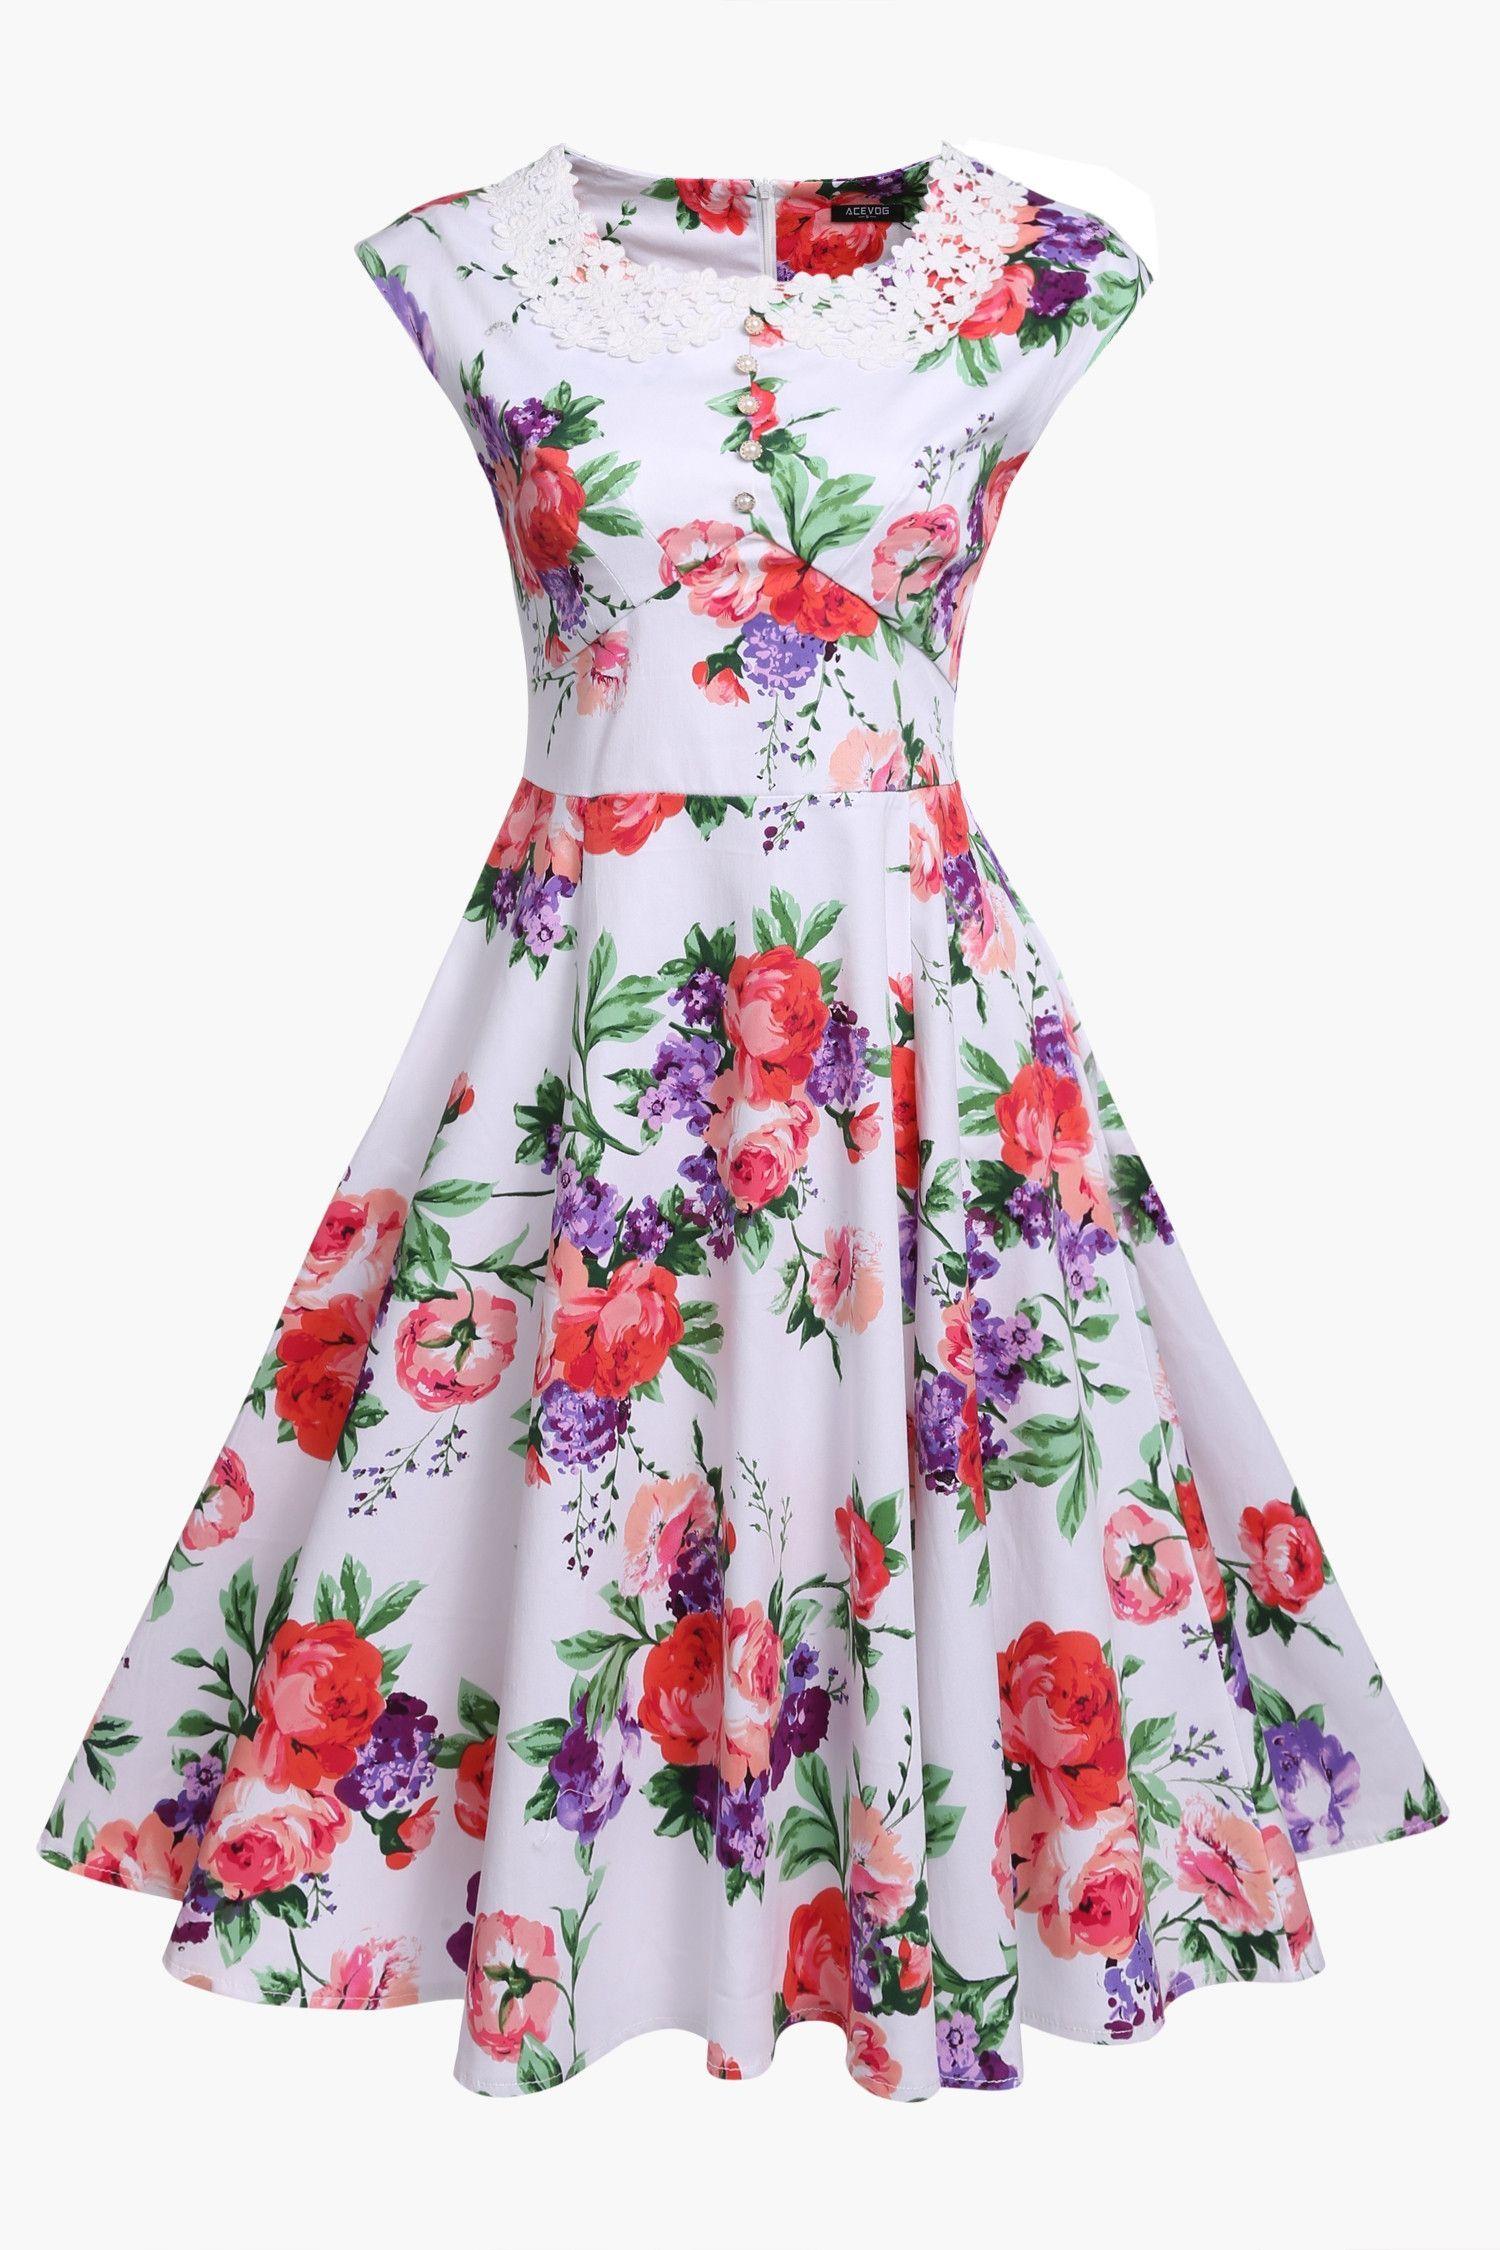 Stylish ladies women sleeveless oneck front button decoration